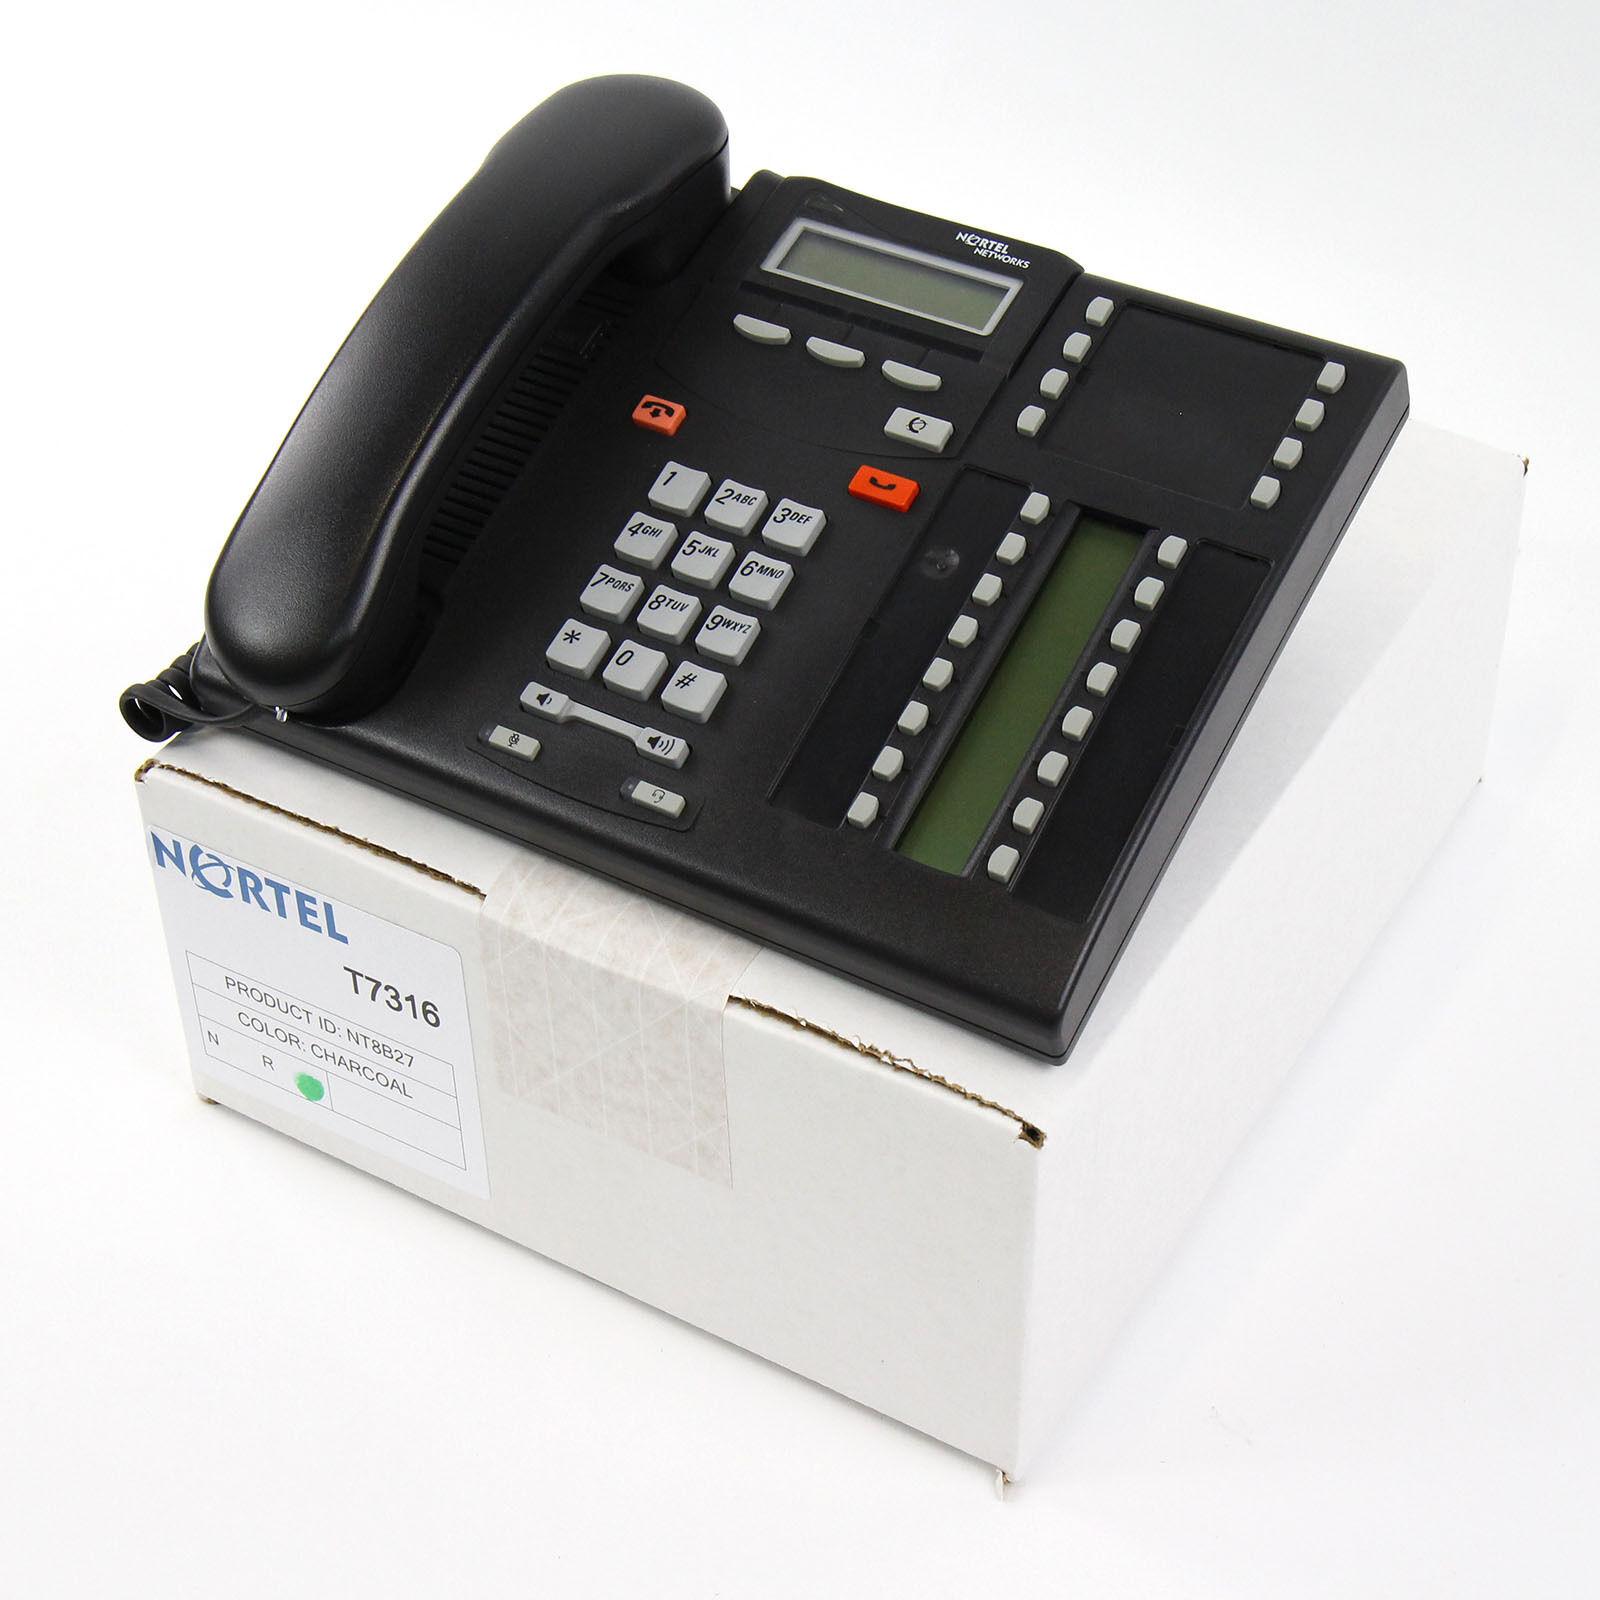 Nortel Norstar T7316 Charcoal Avaya Phone (NT8B27) - Bulk